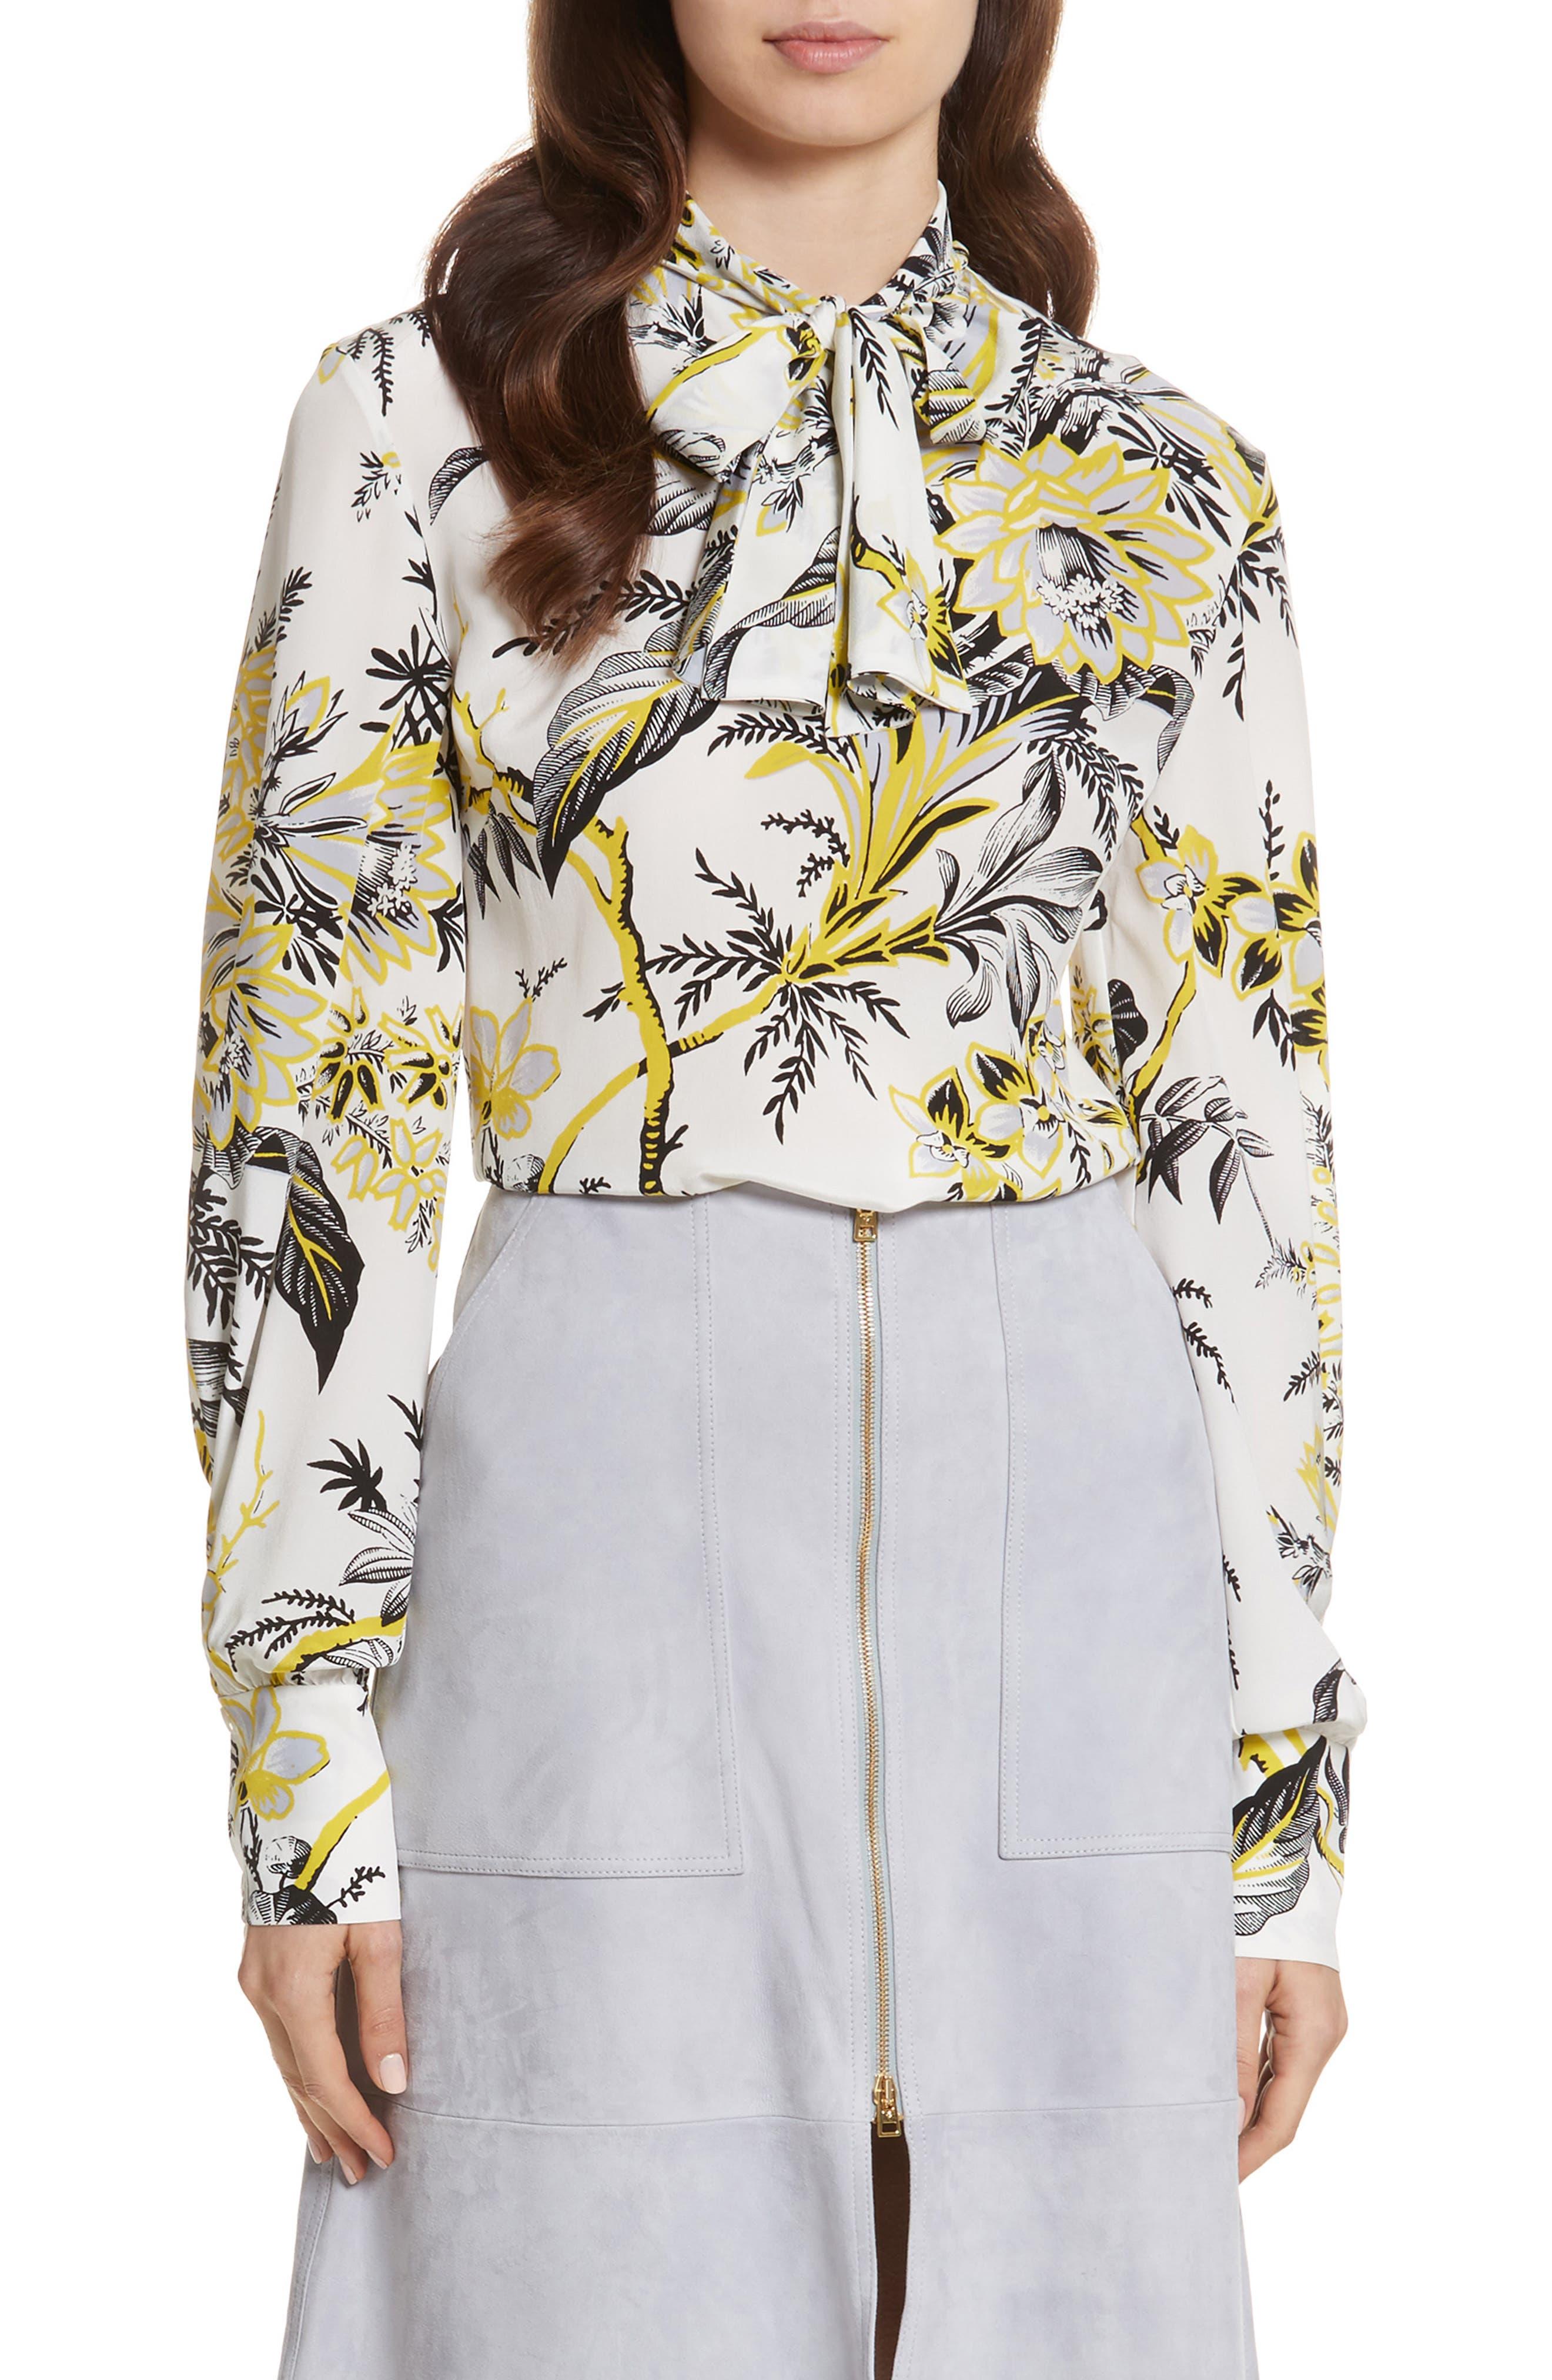 Diane von Furstenberg Tie Neck Silk Blouse,                             Main thumbnail 1, color,                             Avalon Ivory